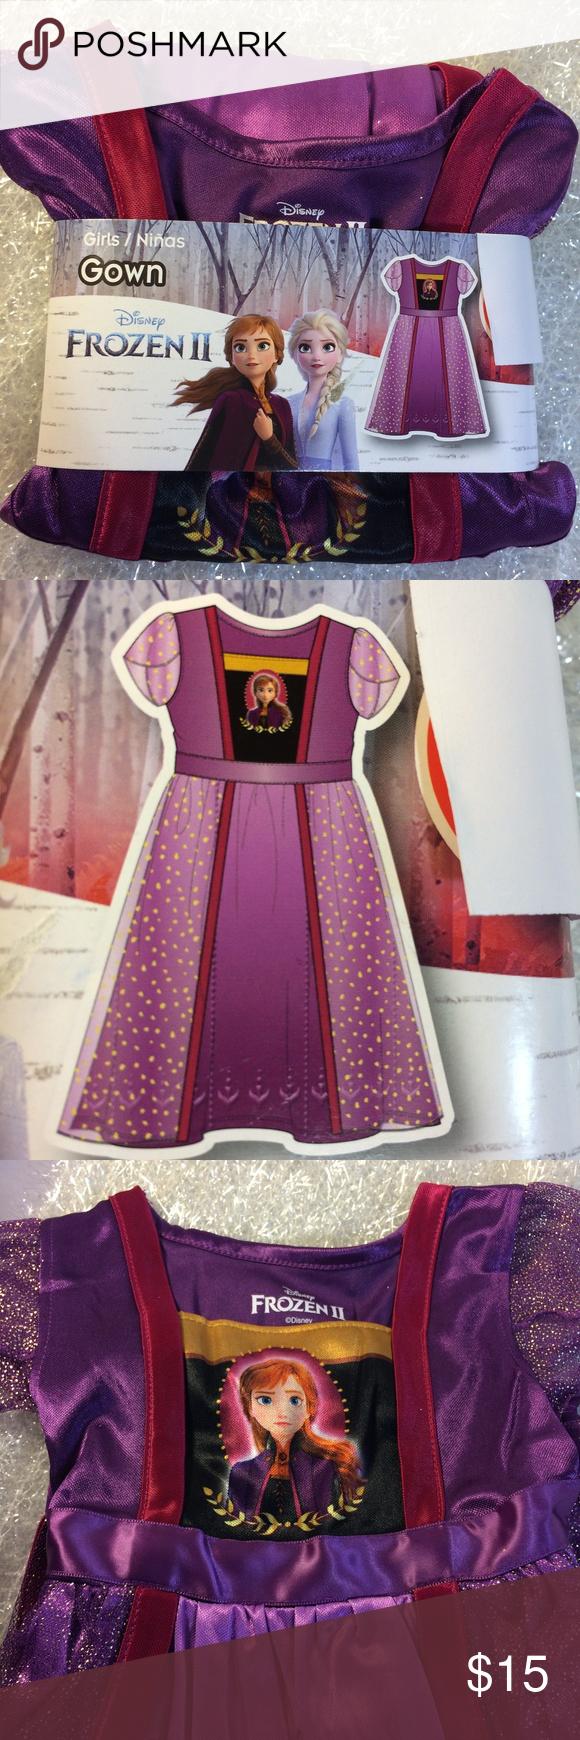 Purple Frozen Ii Anna Fantasy Gown 3t Fantasy Gown Purple Gowns Gowns [ 1740 x 580 Pixel ]